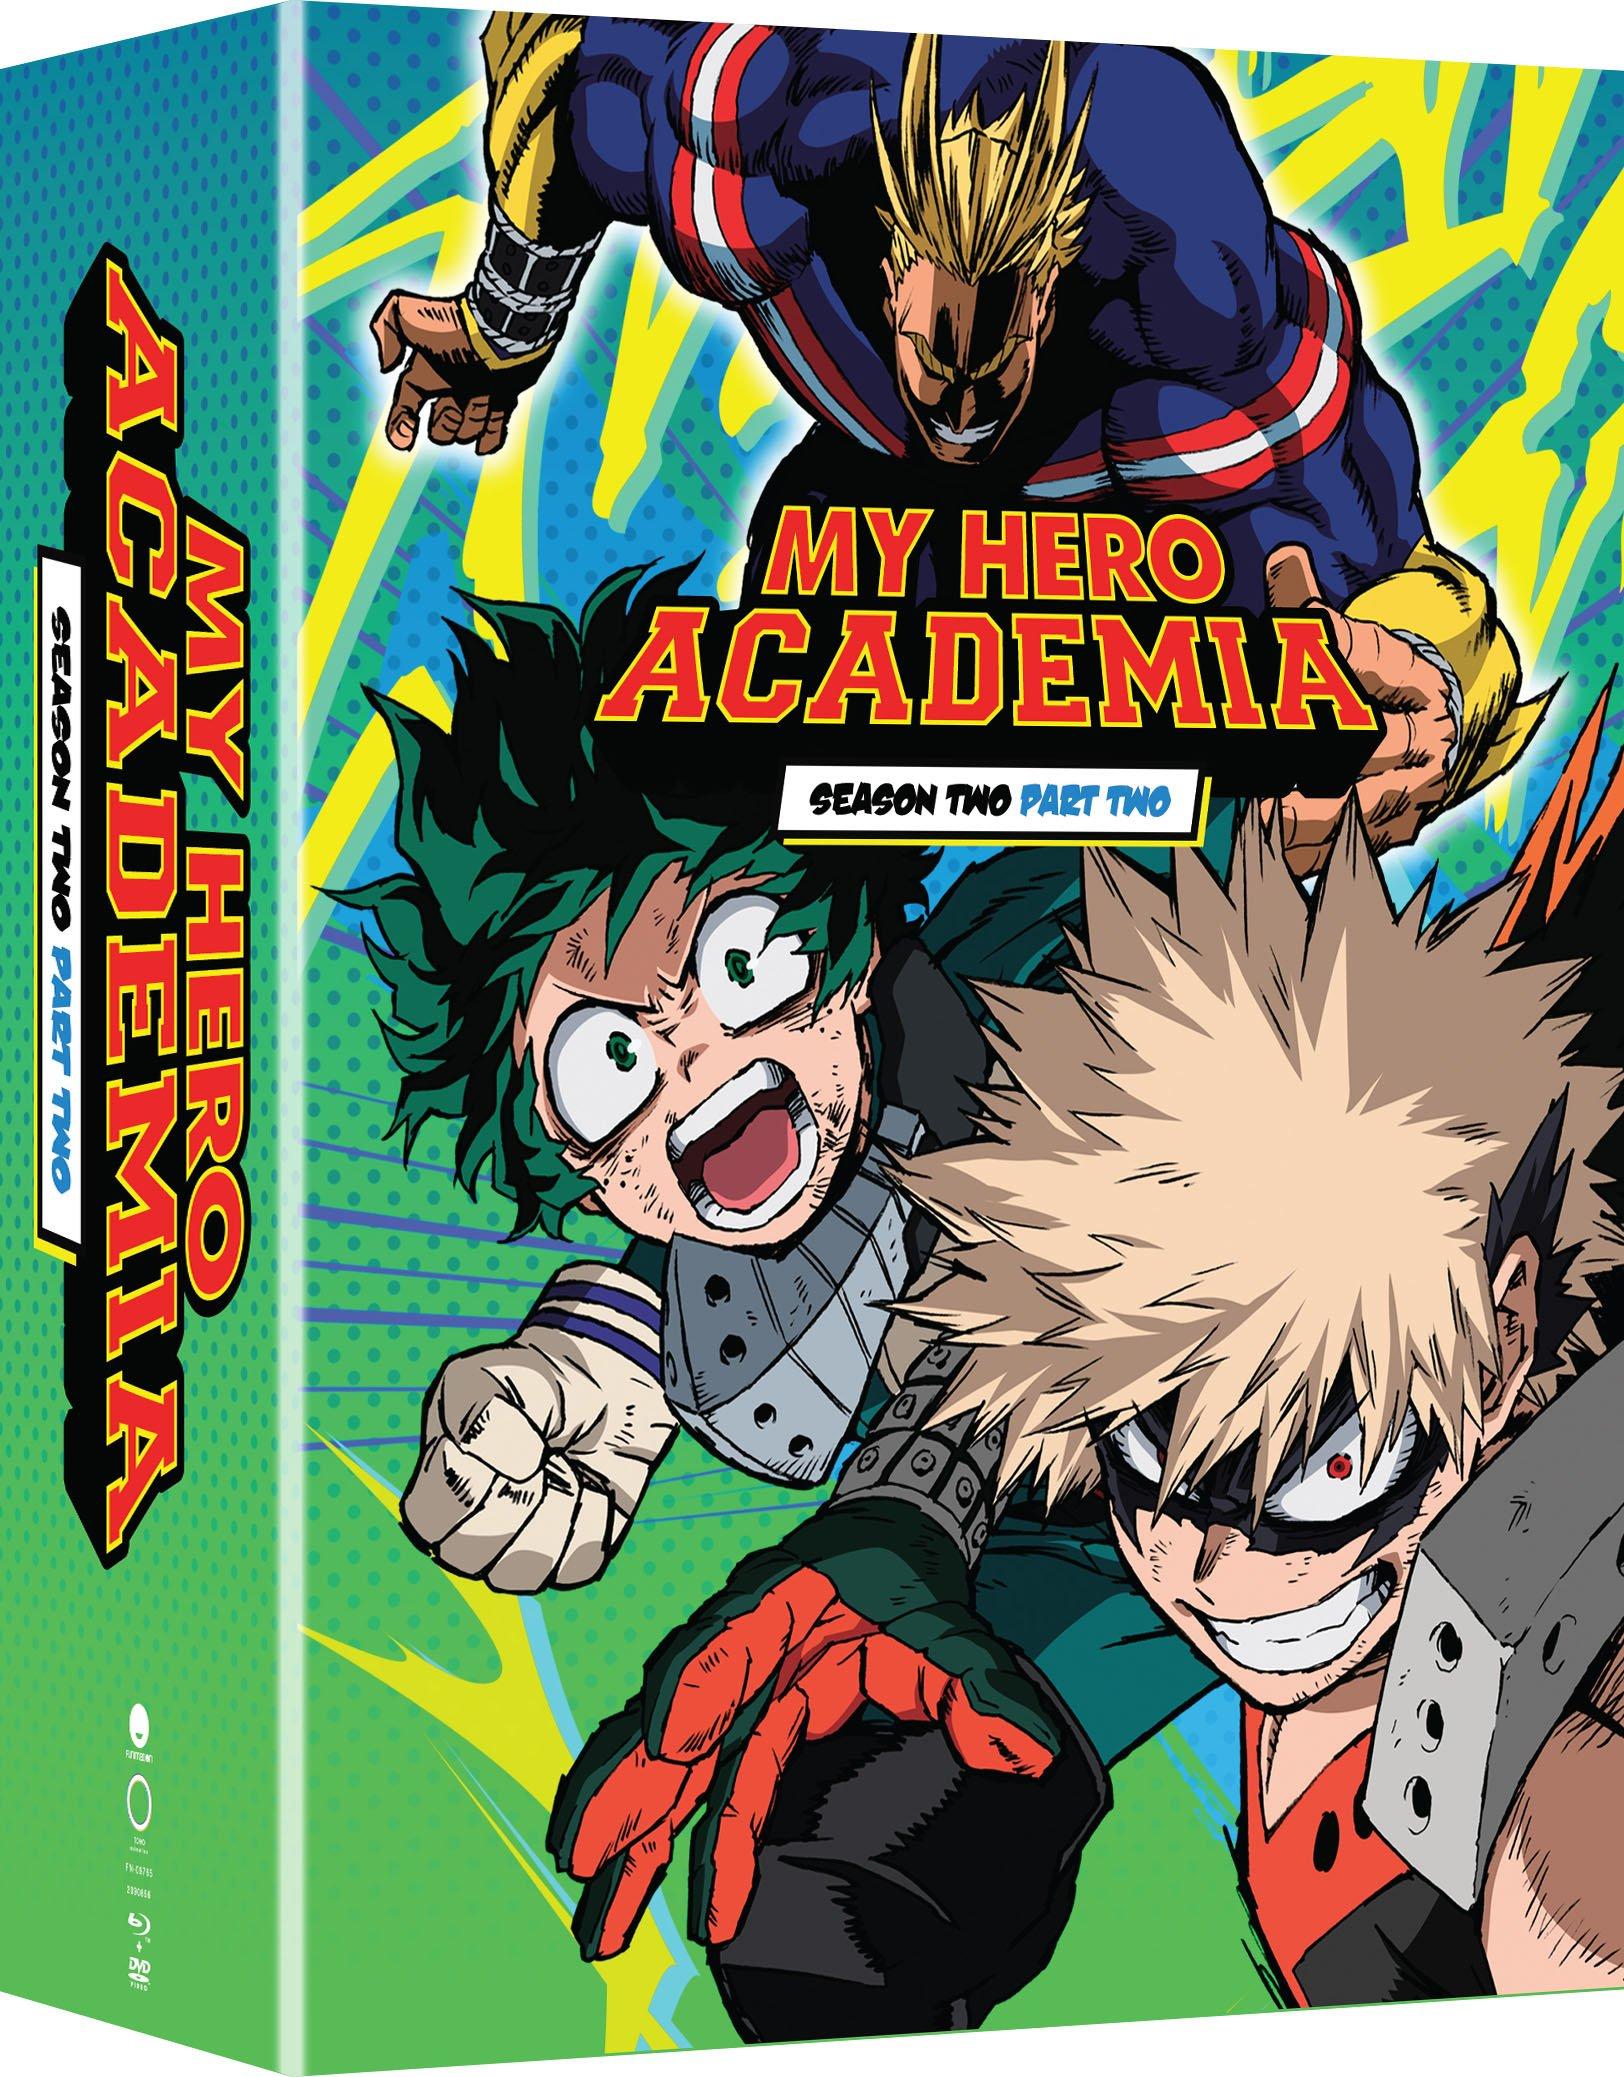 My Hero Academia: Season Two Part Two [Blu-ray]